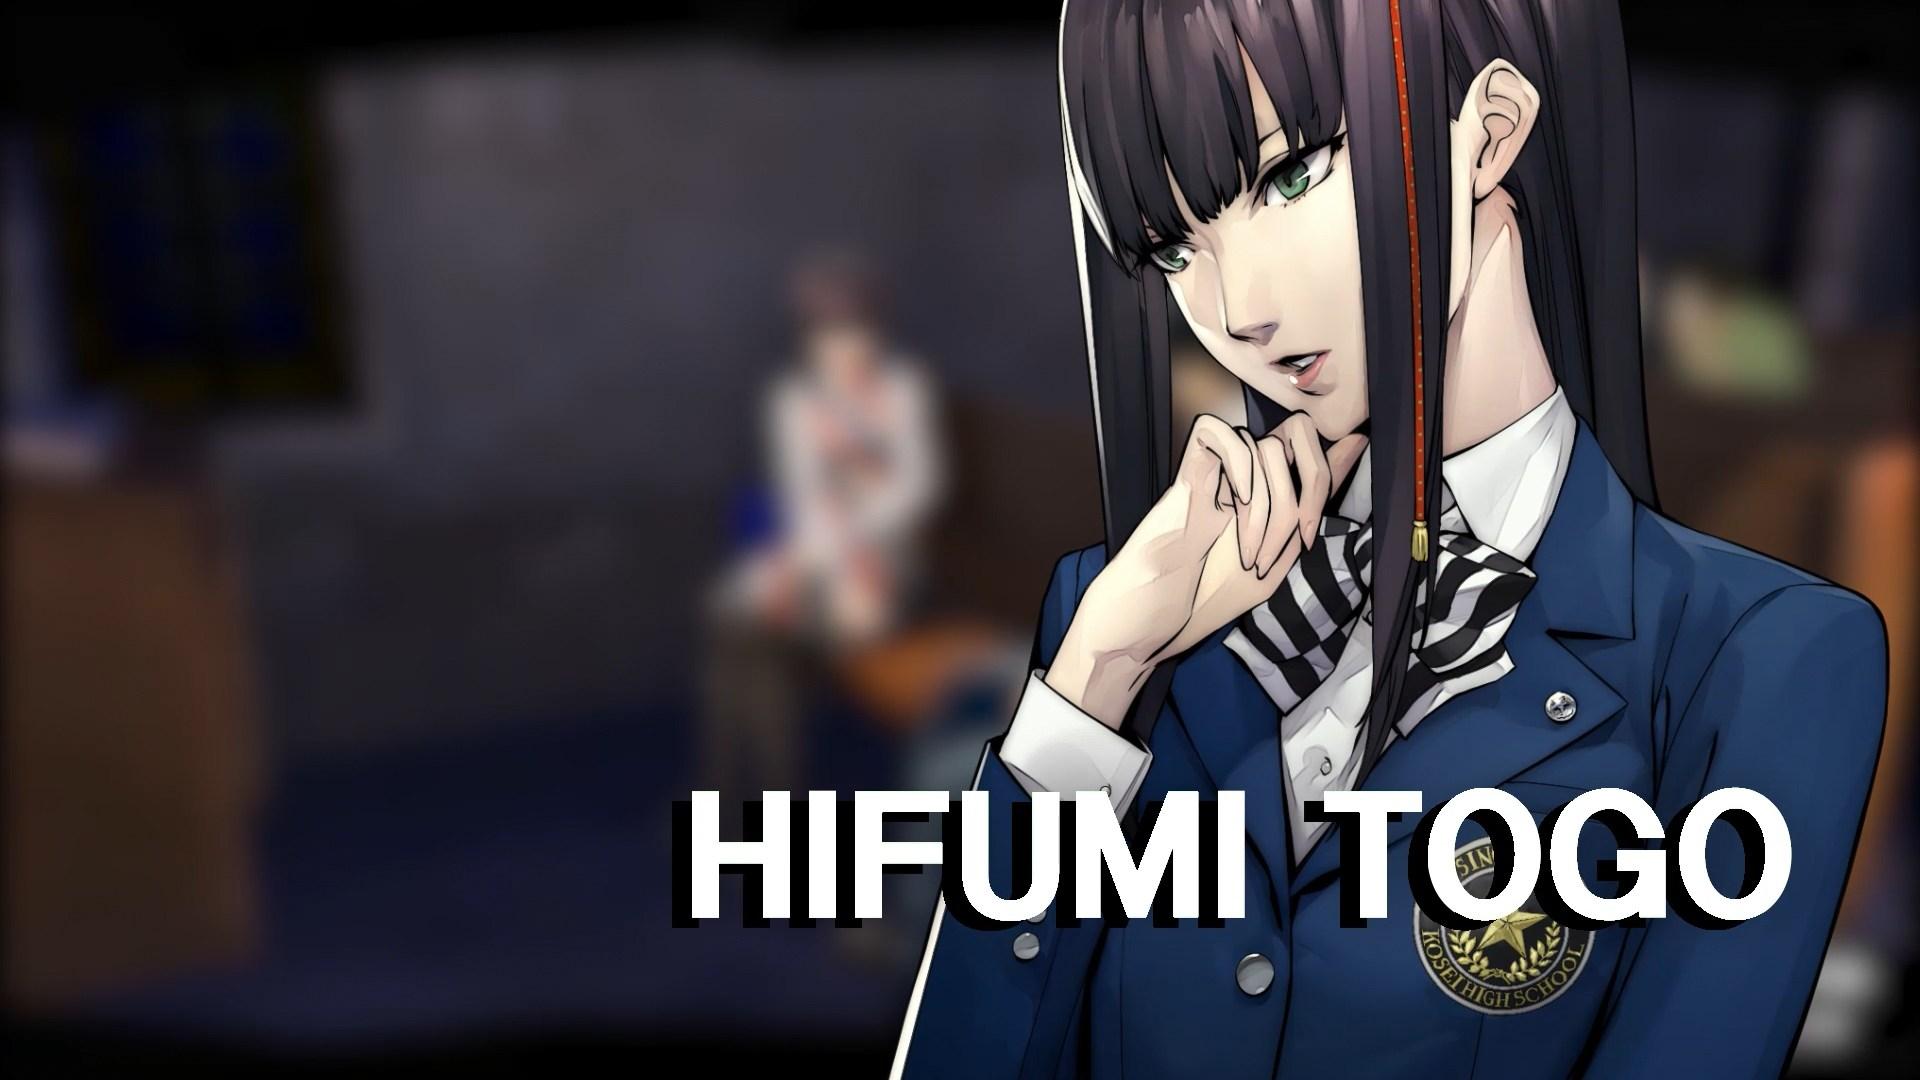 Hifumi Togo, Persona 5